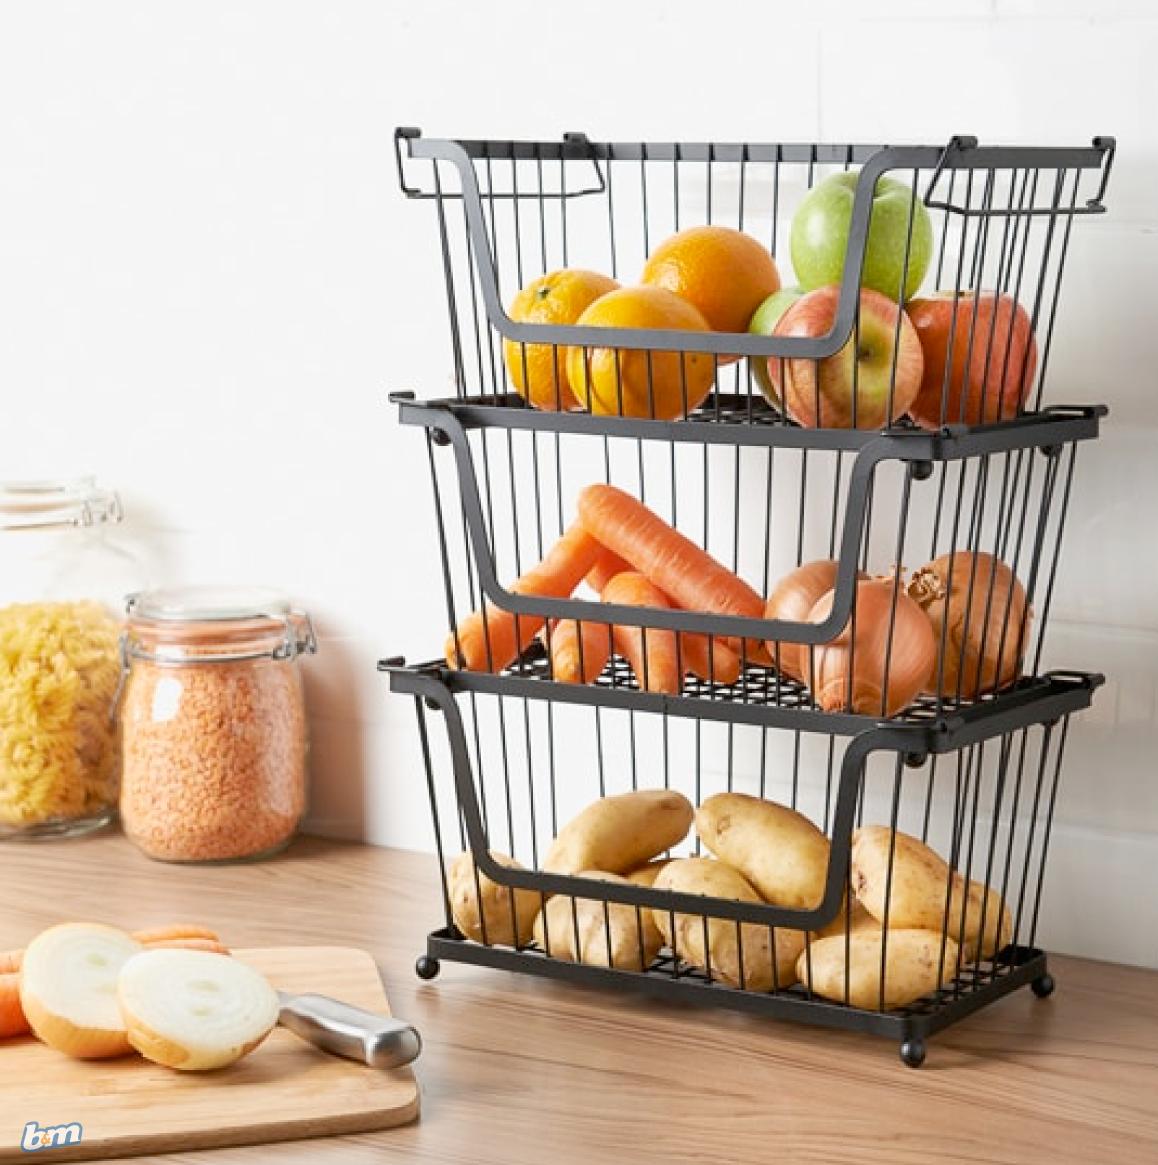 Stackable Basket in 2020 Kitchen counter storage, Fruit